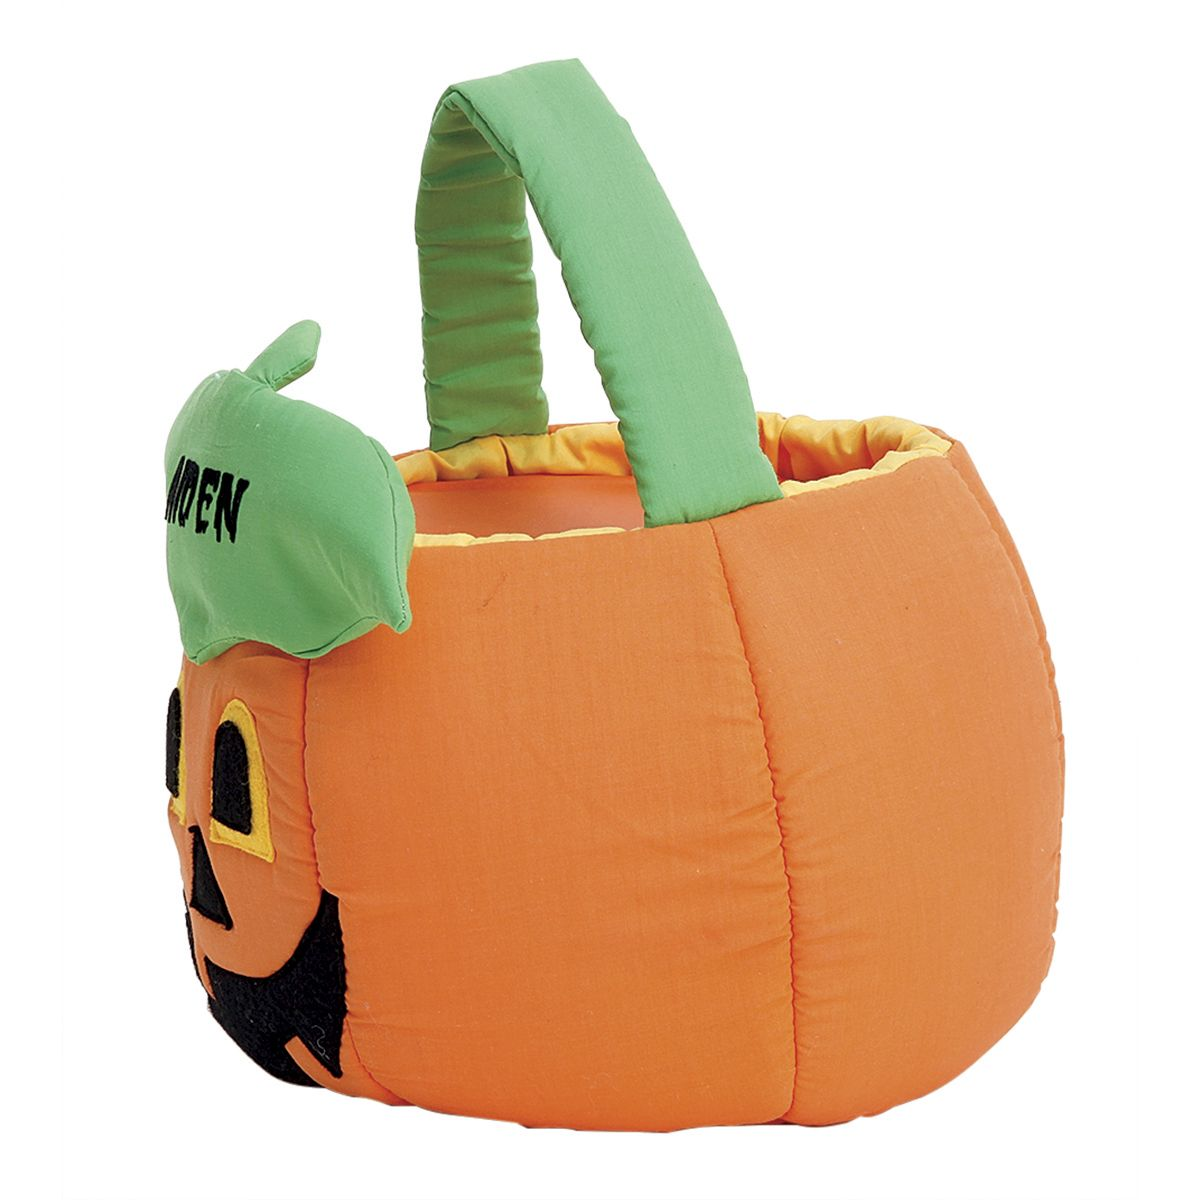 Jack-o'-Lantern Treat Basket